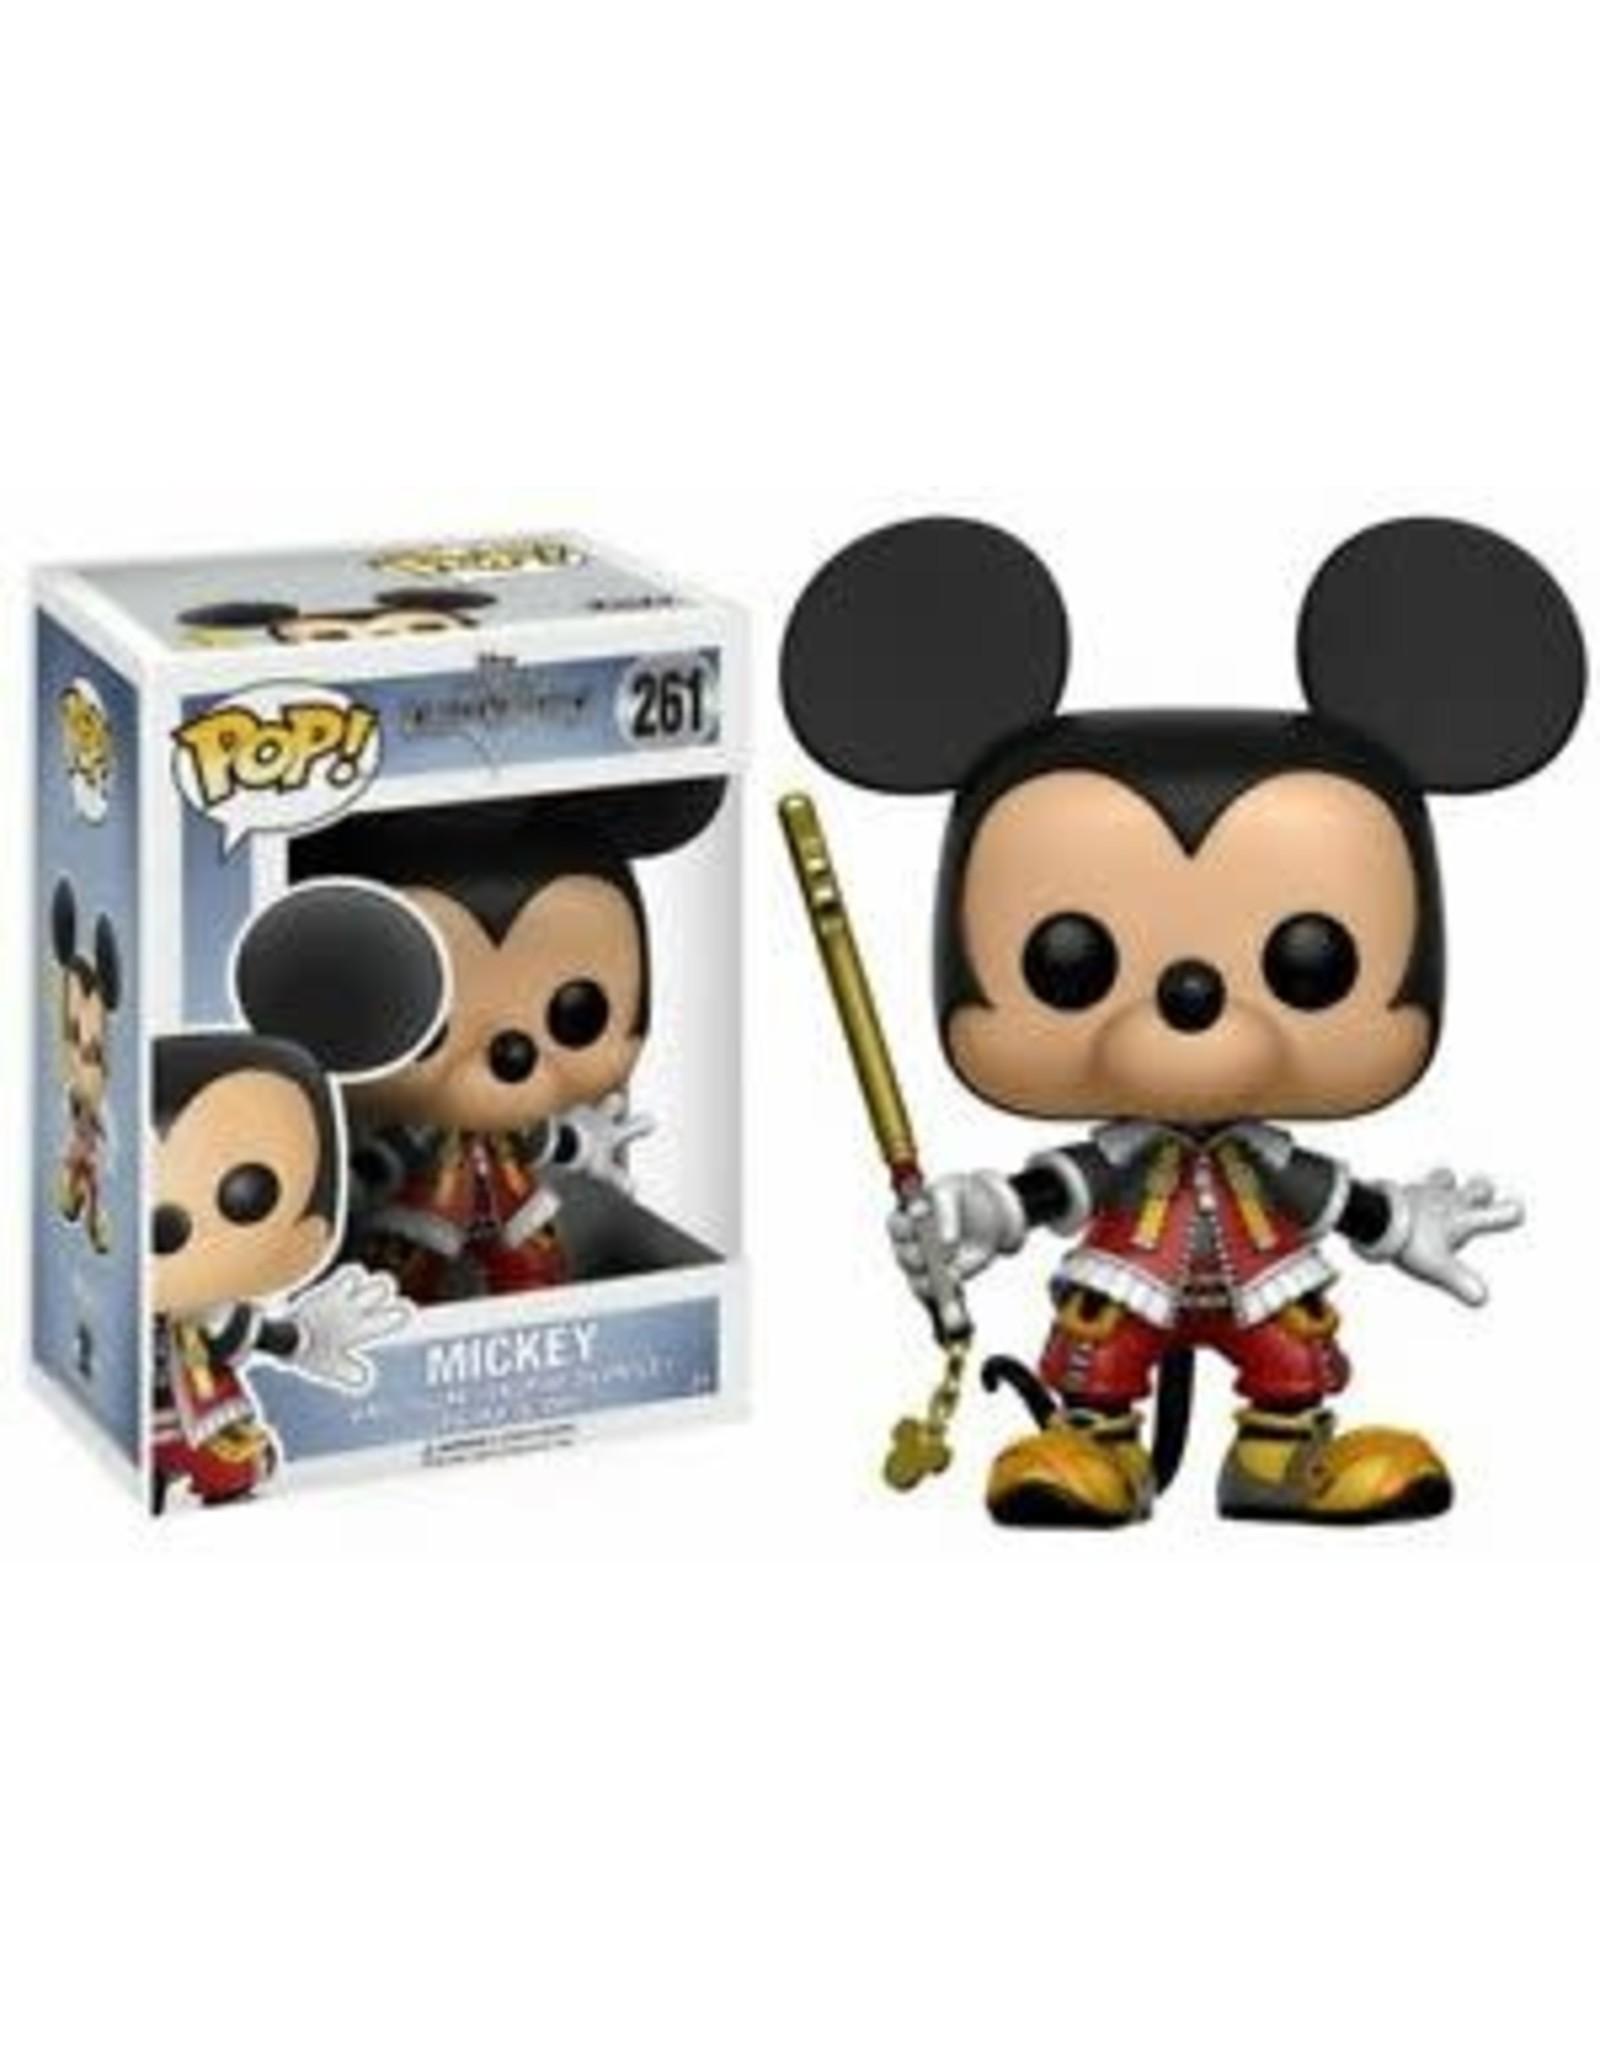 Funko Pop! Funko Pop! Disney nr261 Kingdom Hearts - Mickey